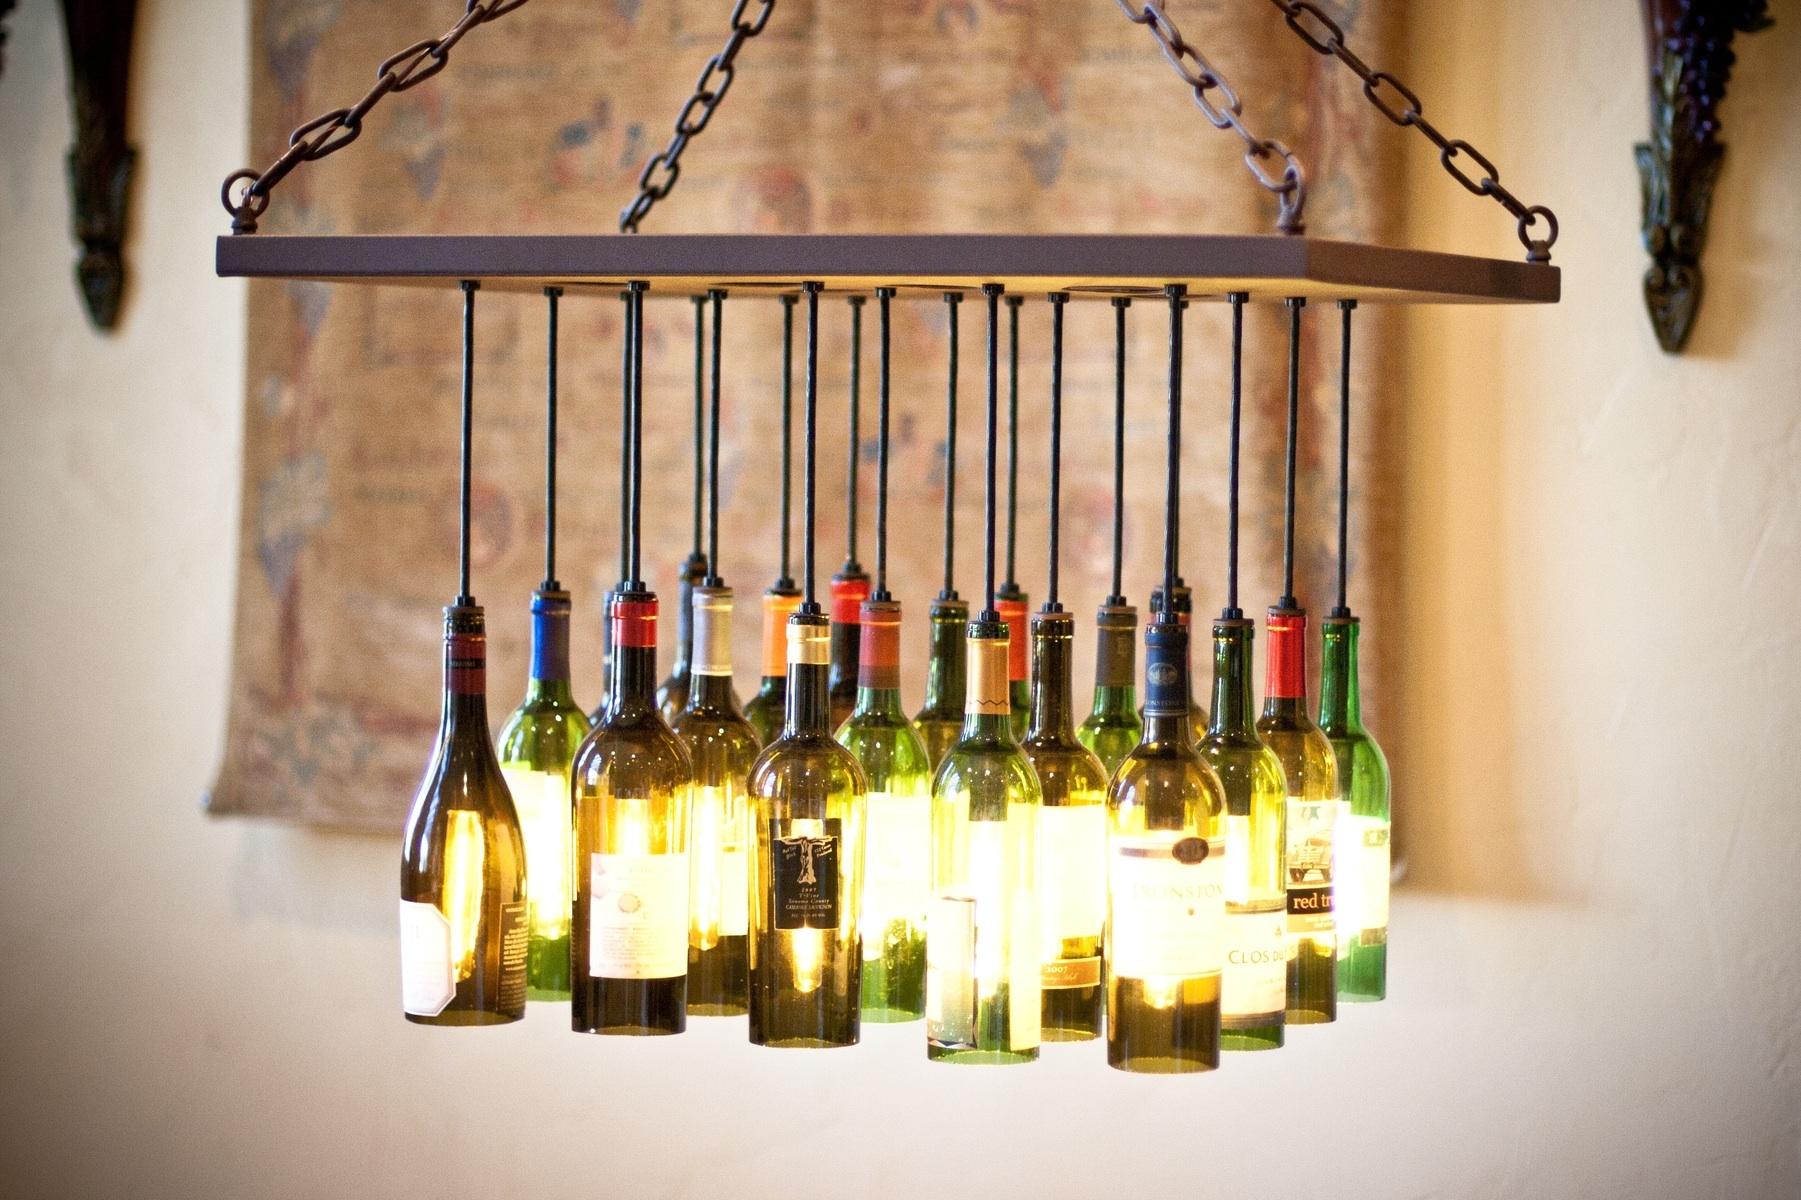 Making Wine Bottle Lights Bottle Light Fixture Gallery Home Fixtures Decoration Ideas